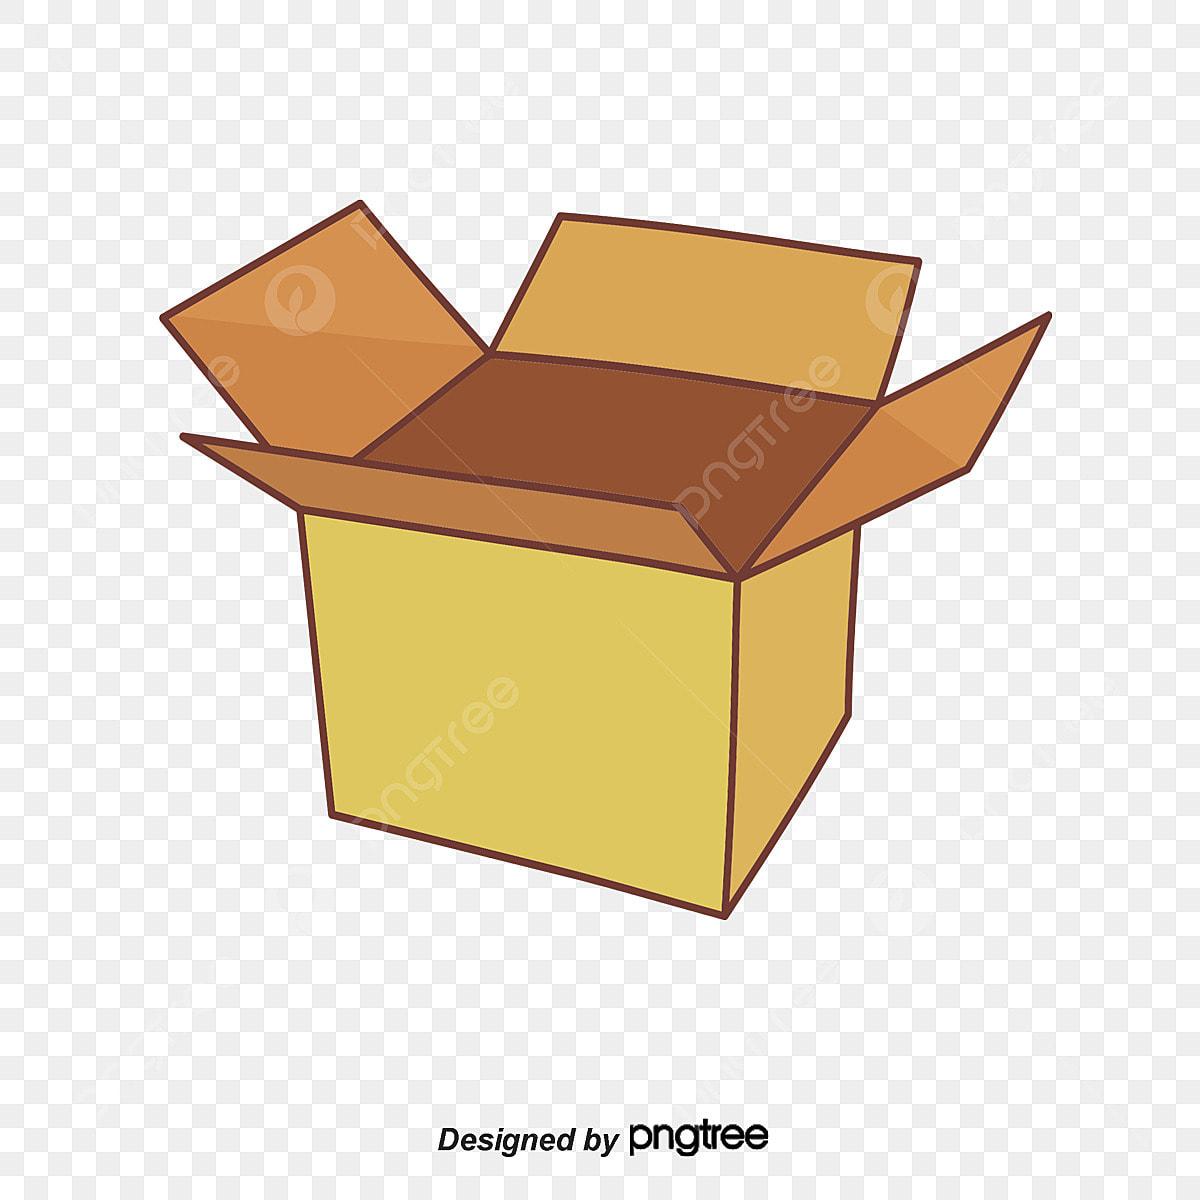 3d Model Of Open Cardboard Boxes, 3d Model, Open The Box